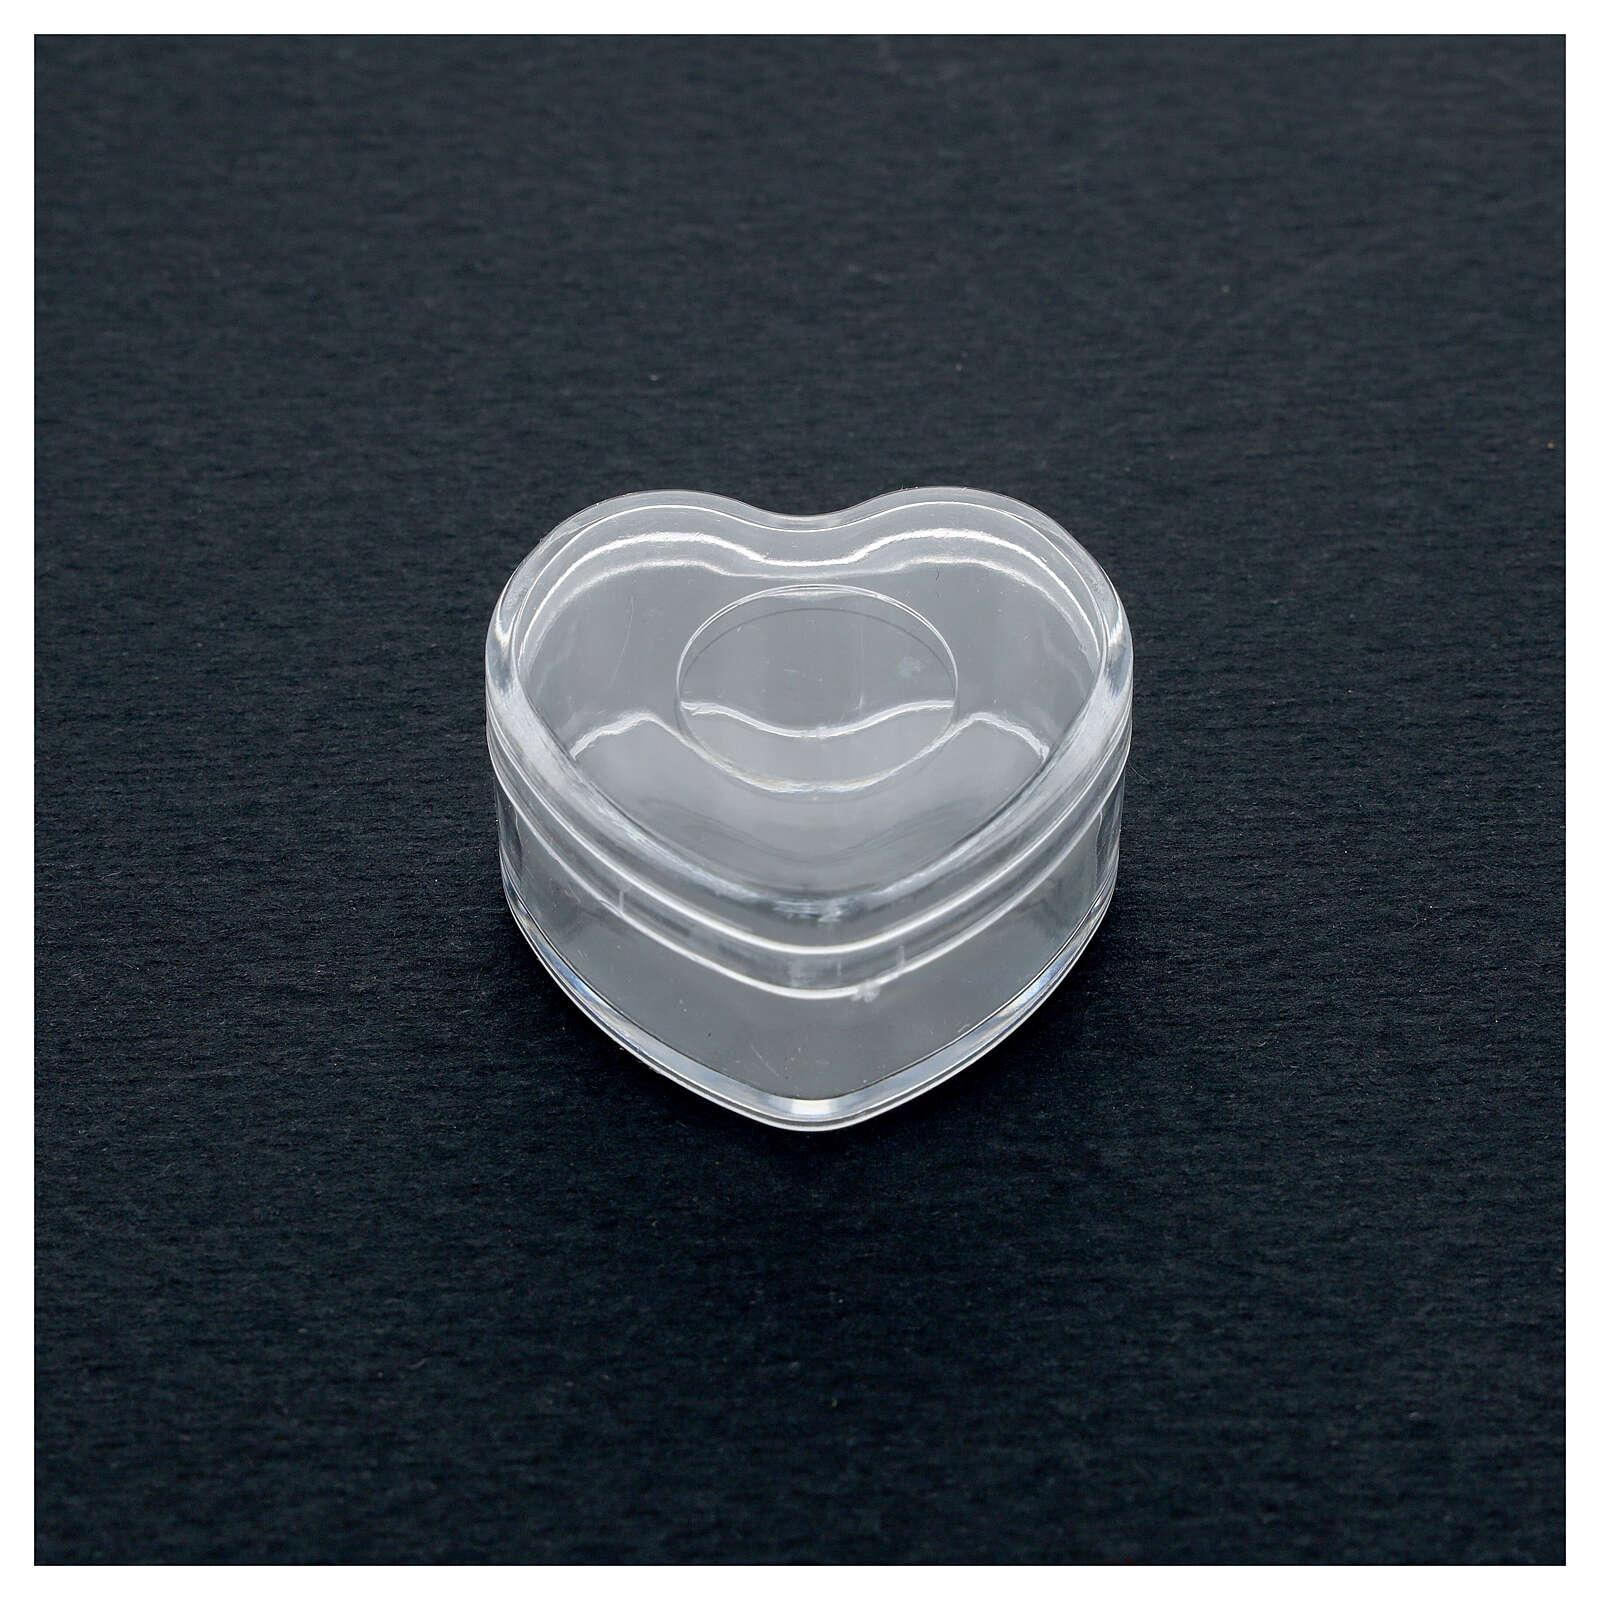 Rosary holder heart box 3-4 mm beads 4